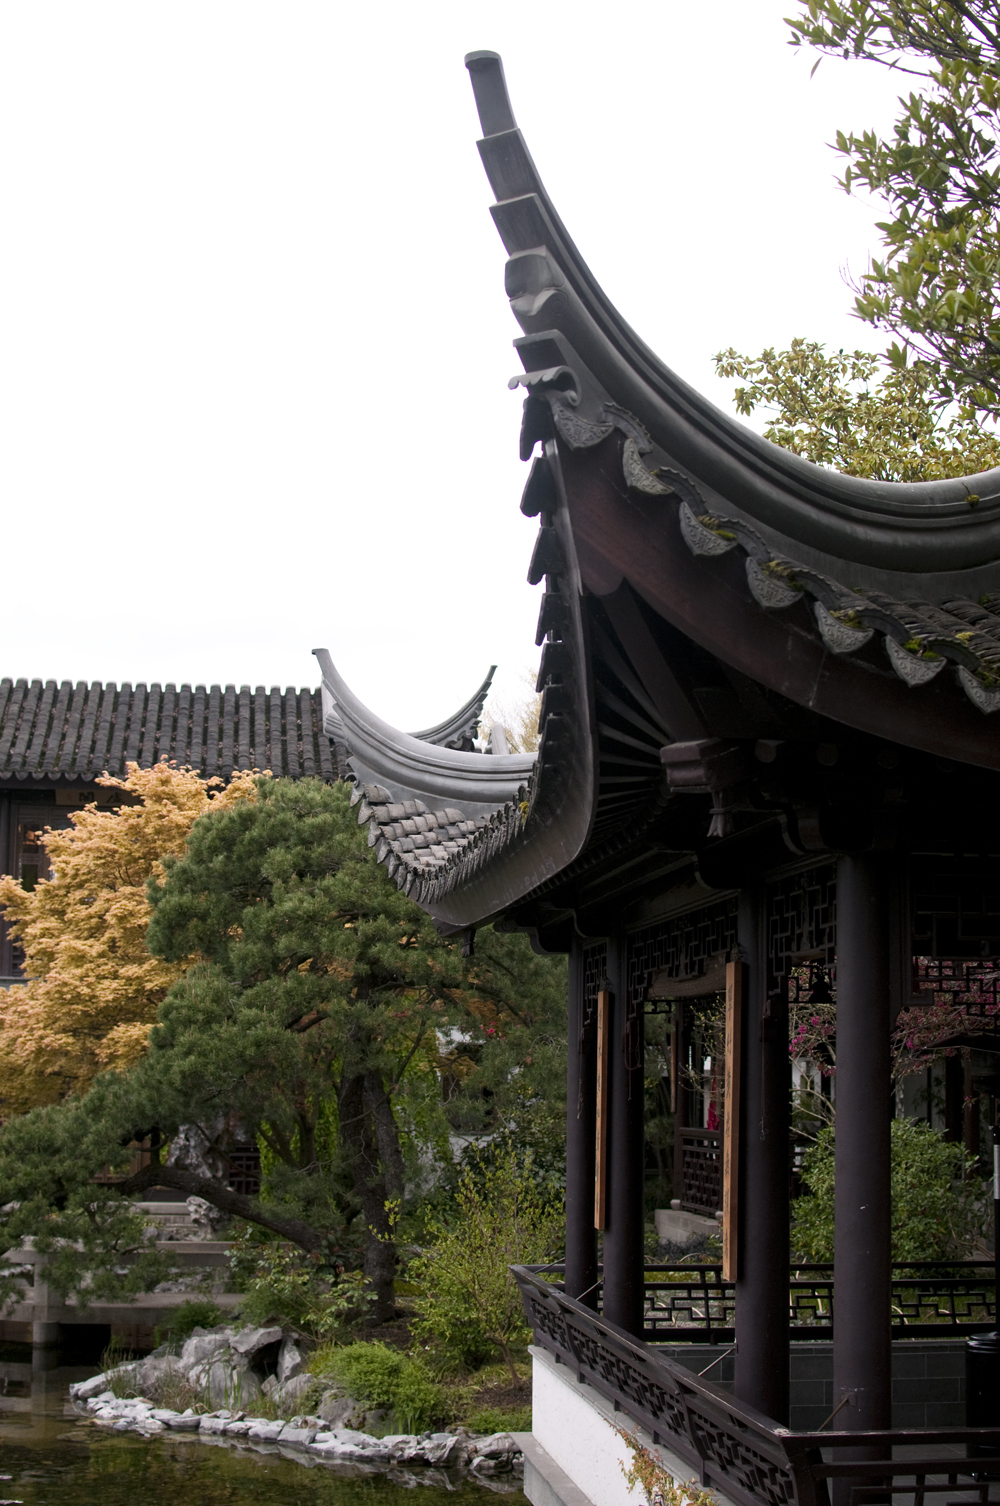 lan-su-garden-portland-oregon-12.jpg